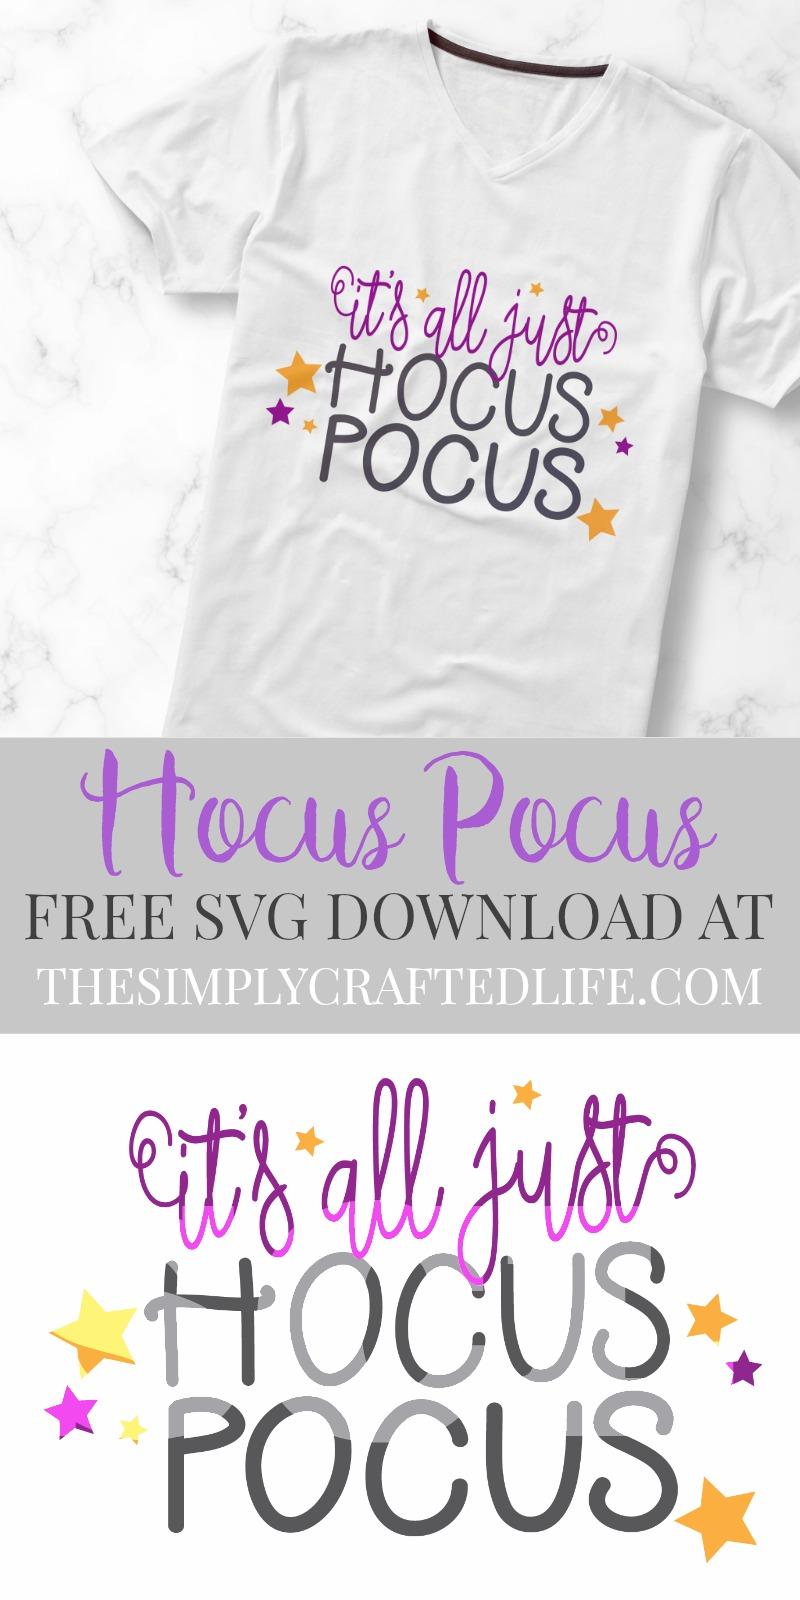 Free Hocus Pocus SVG Cut File for Cricut or Silhouette